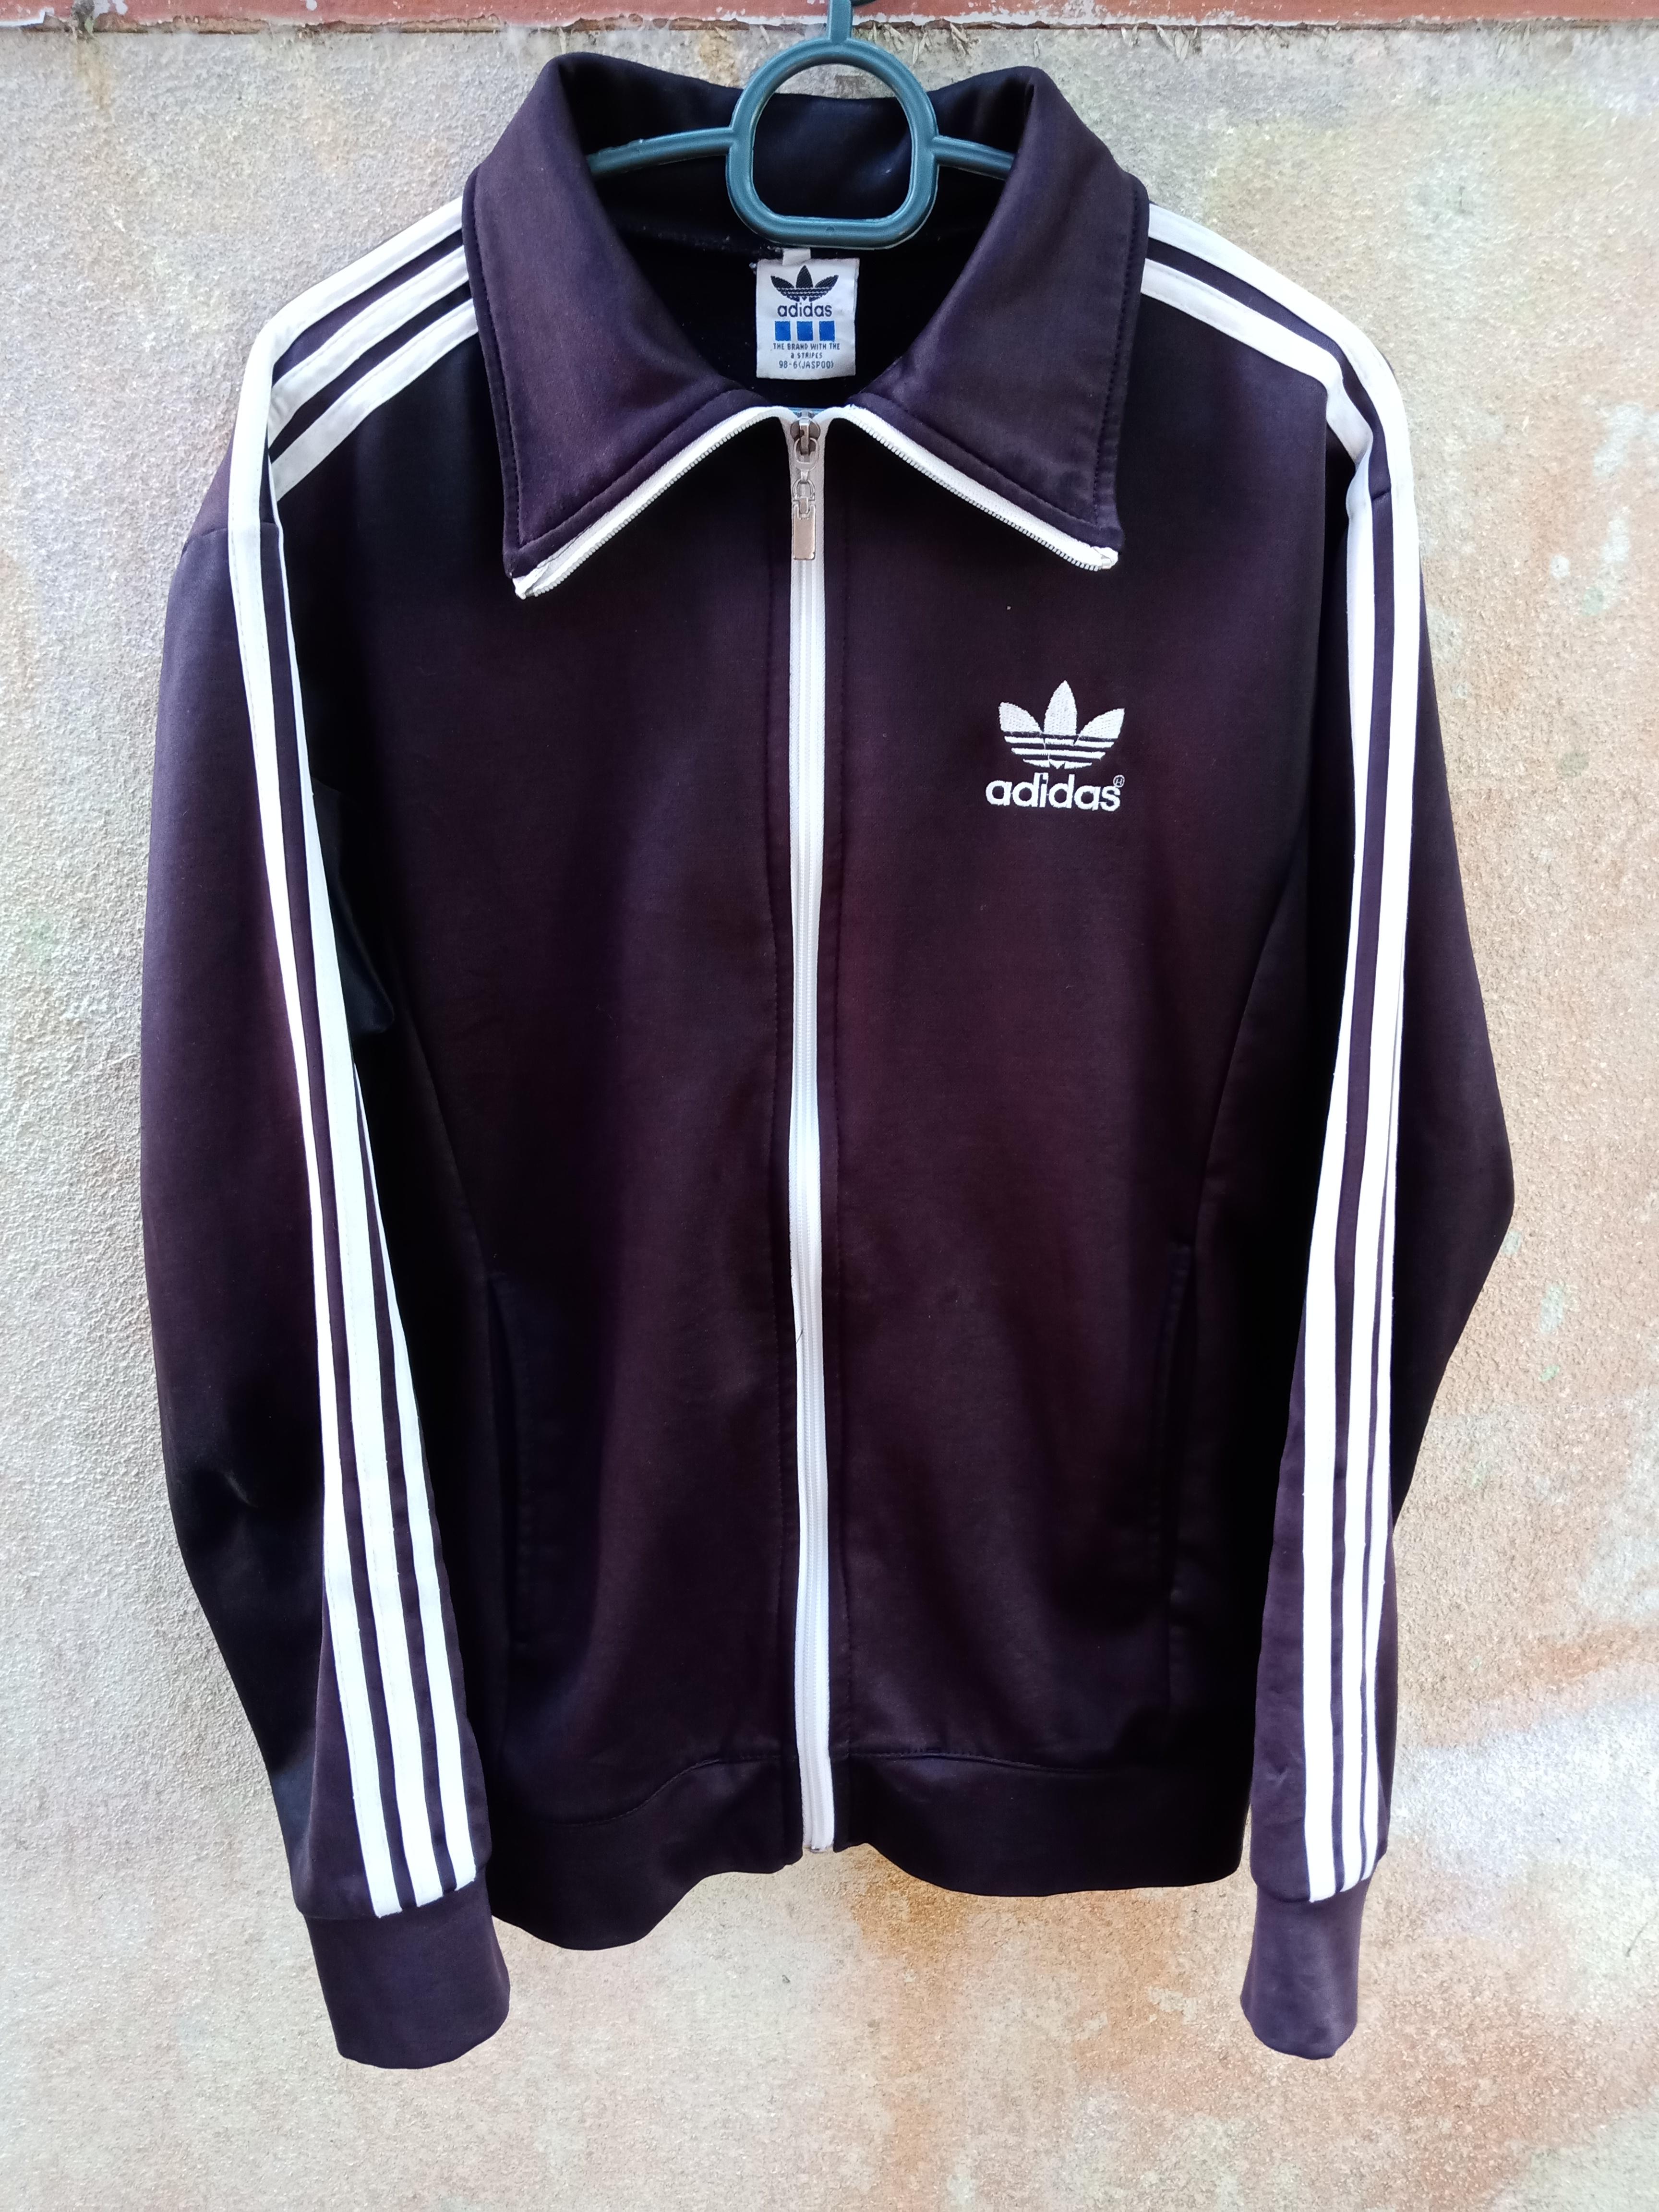 demanda Esquivo disco  Adidas Adidas Track Top Jacket Saiz M Black Stripe White | Grailed